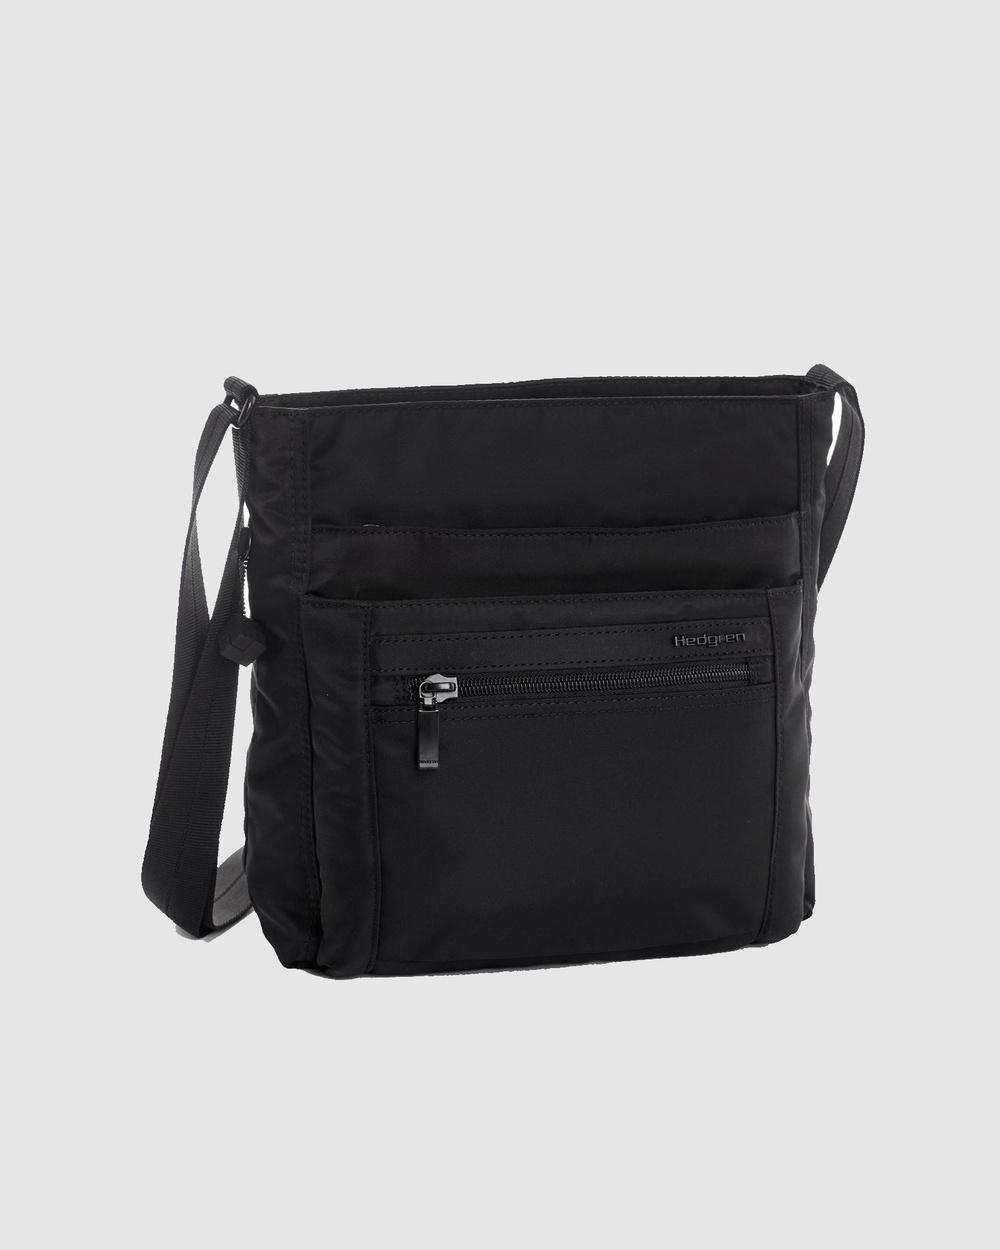 Hedgren Orva Duffle Bags Black Australia